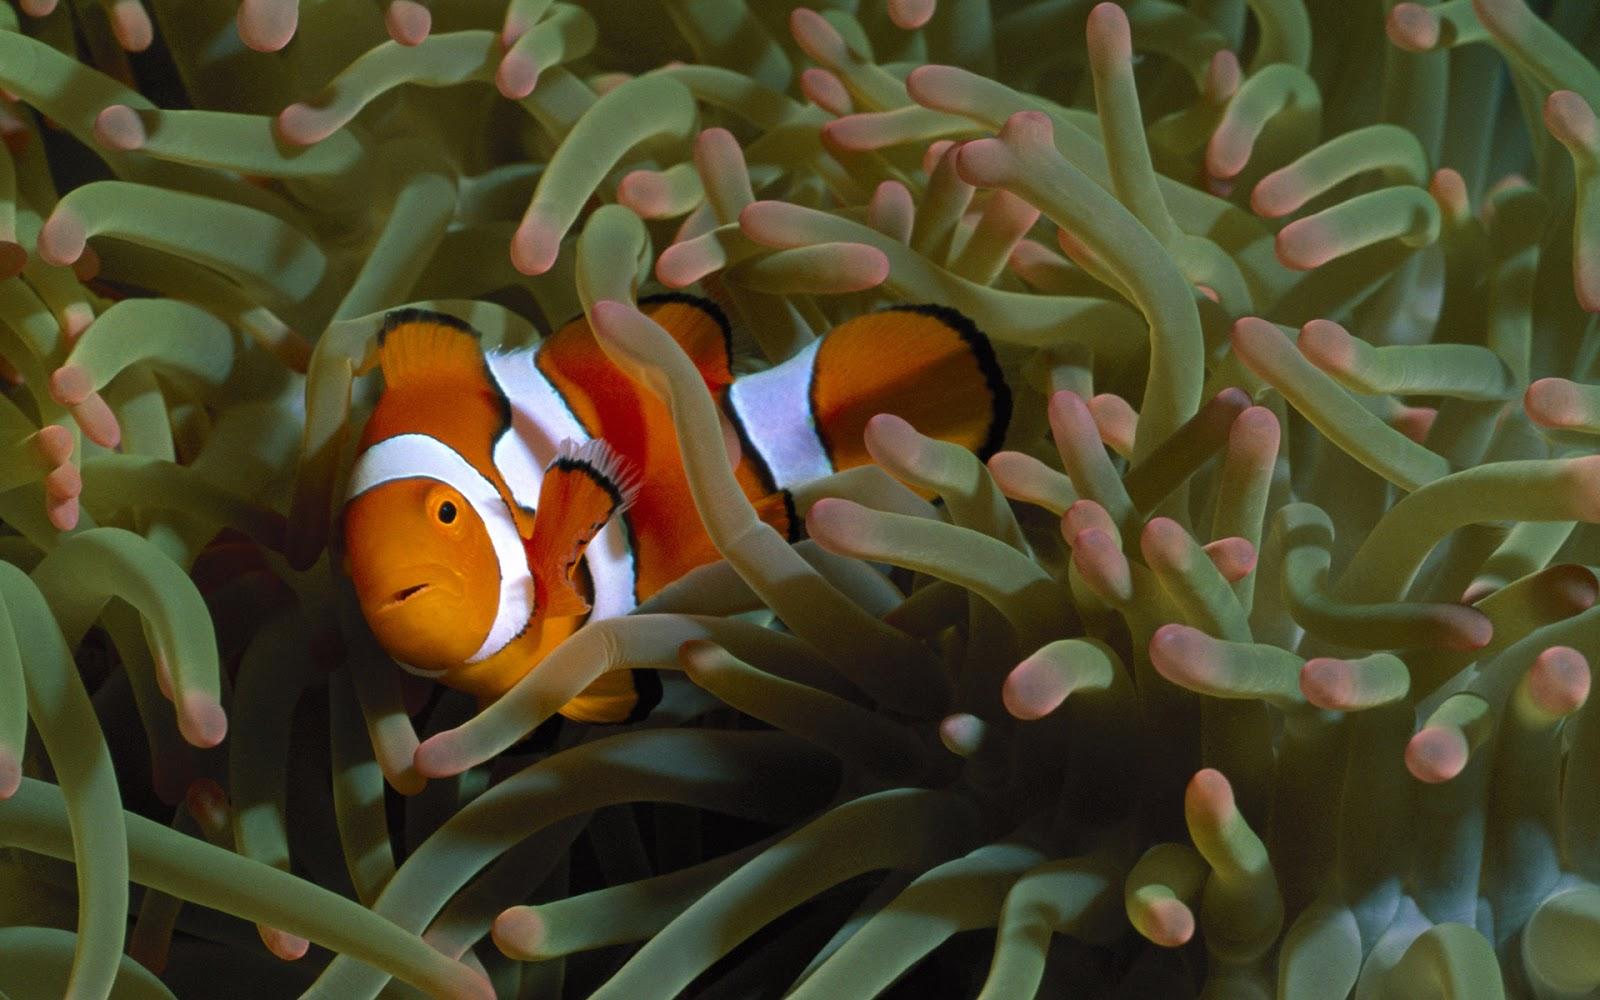 About clown fish nemo fish clown fish for Clown fish scientific name